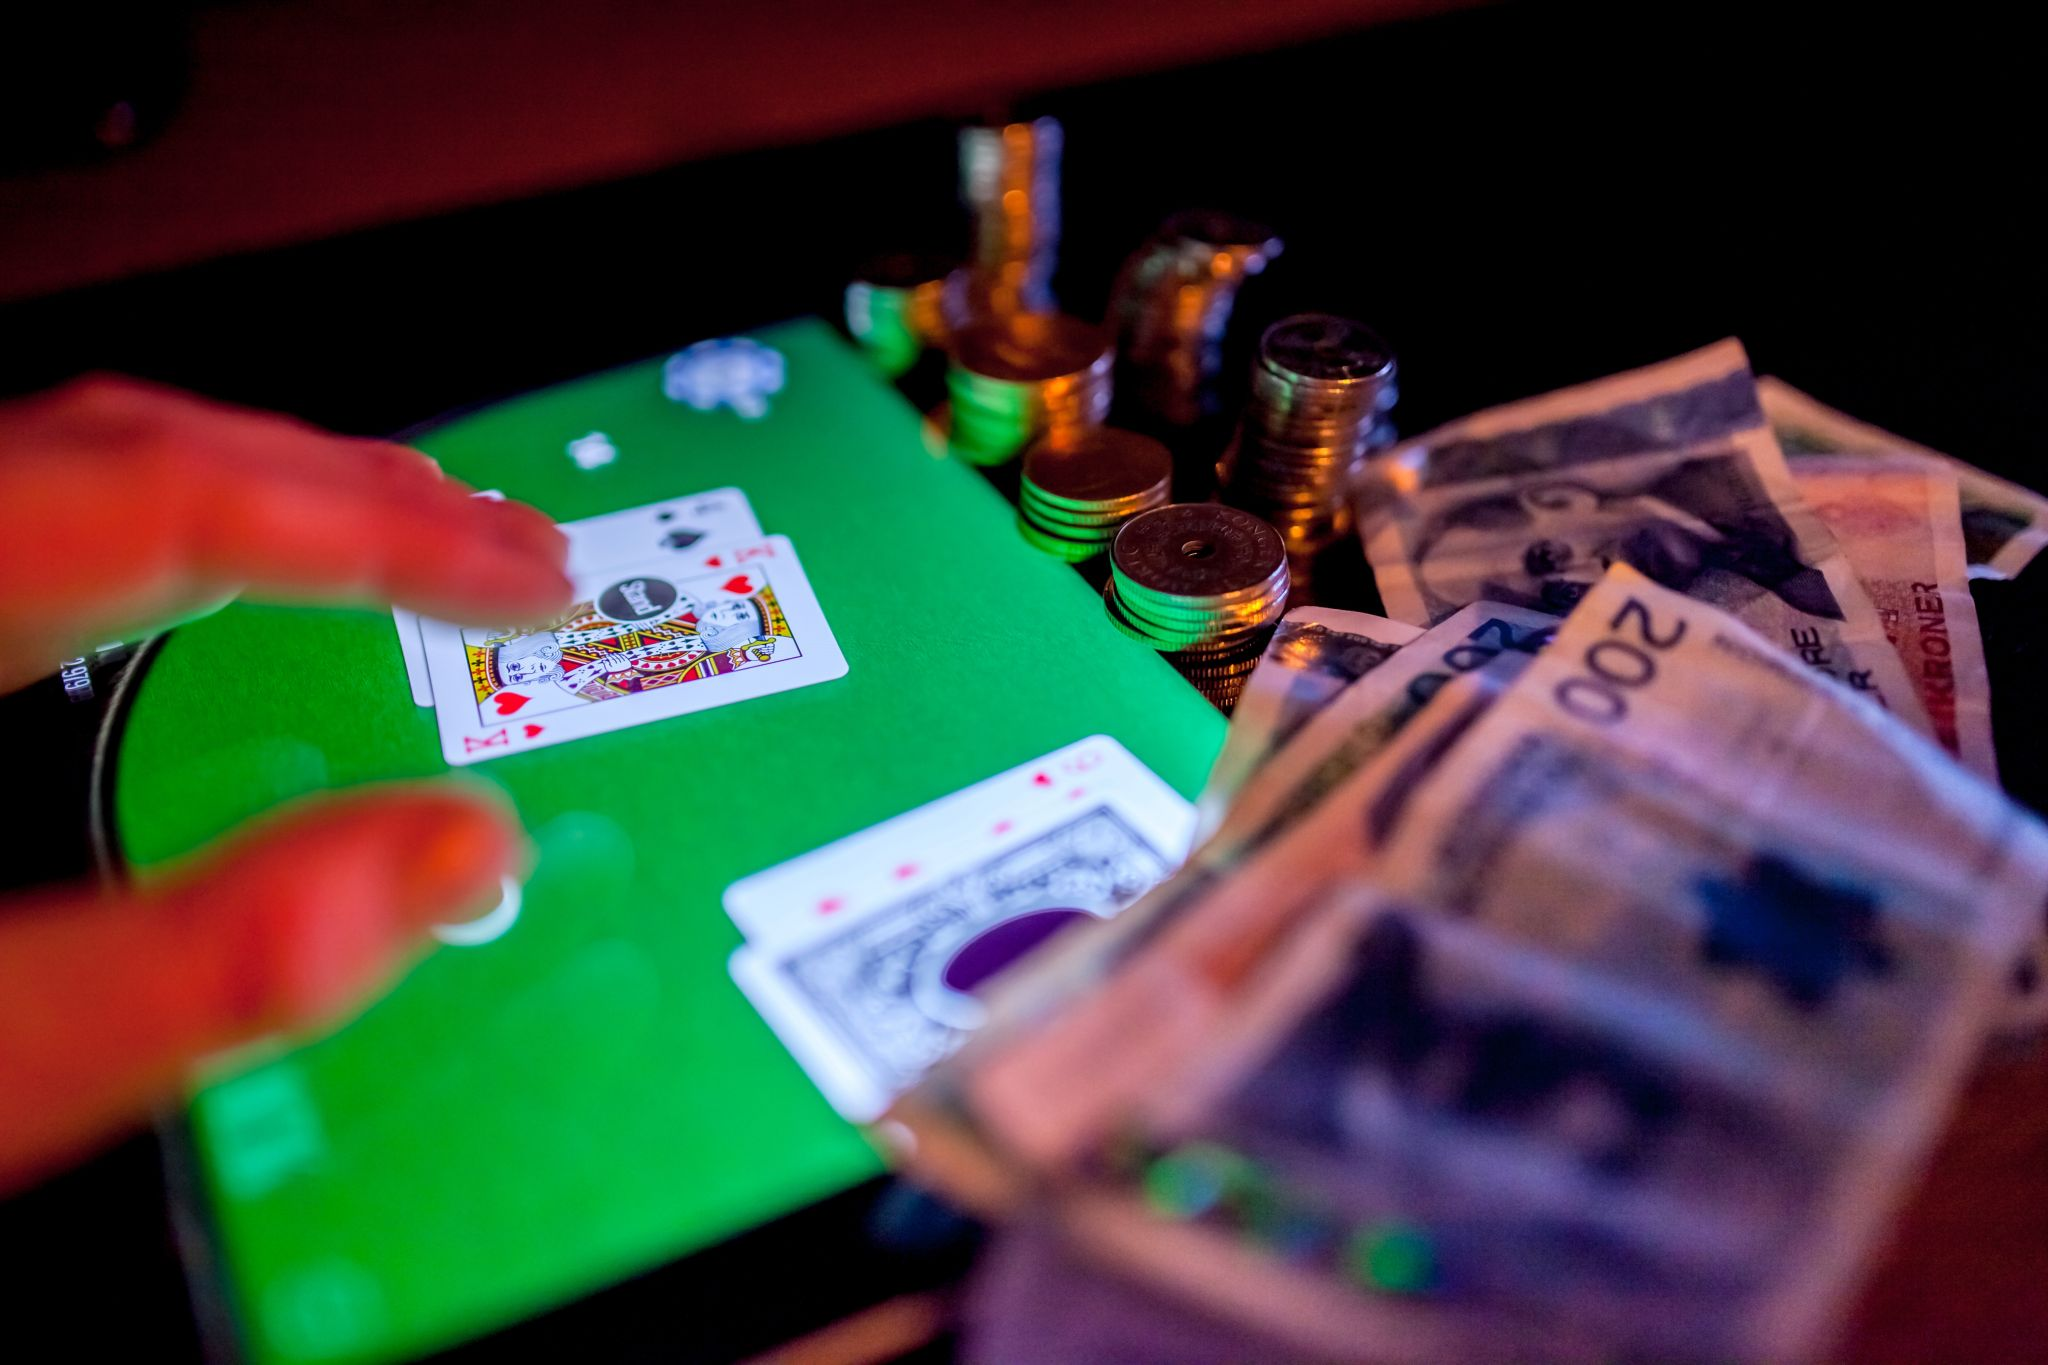 a gambling card game